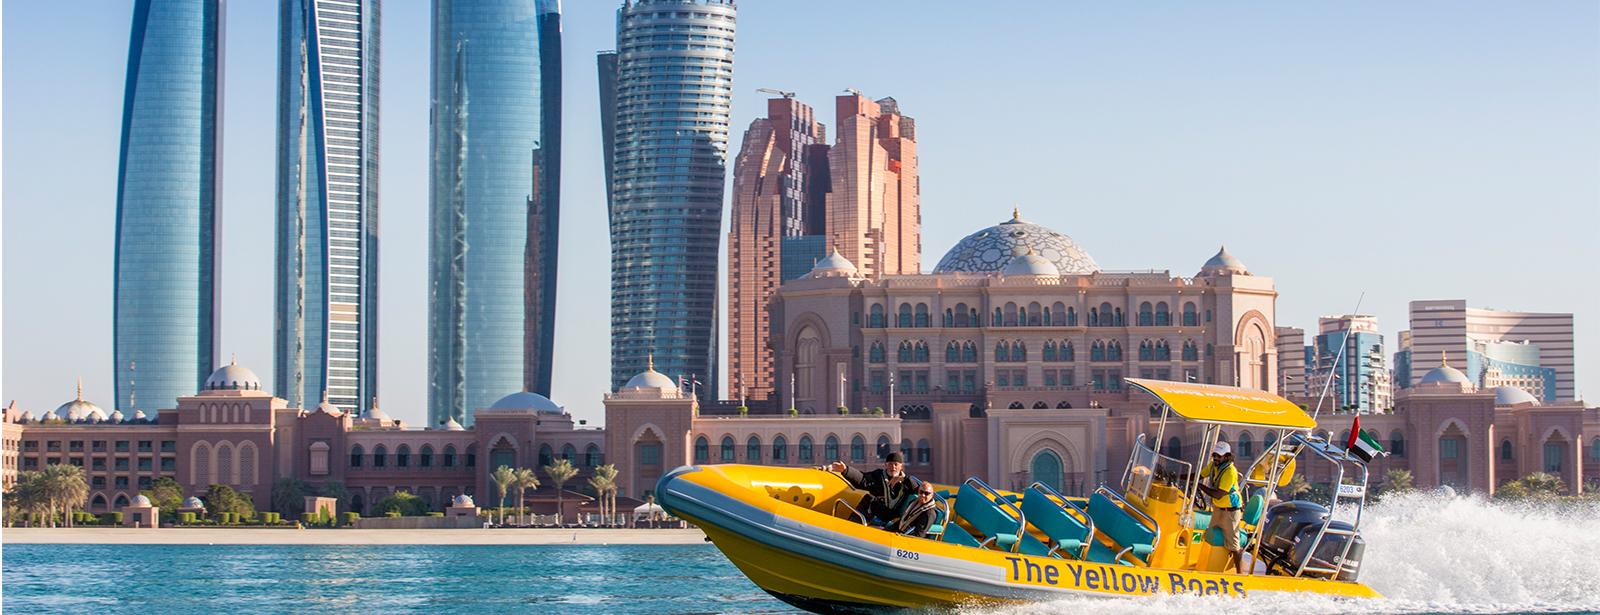 60 Minutes Boat Tour- Emirates Palace Marina, Corniche, Lulu Island (Abu Dhabi)